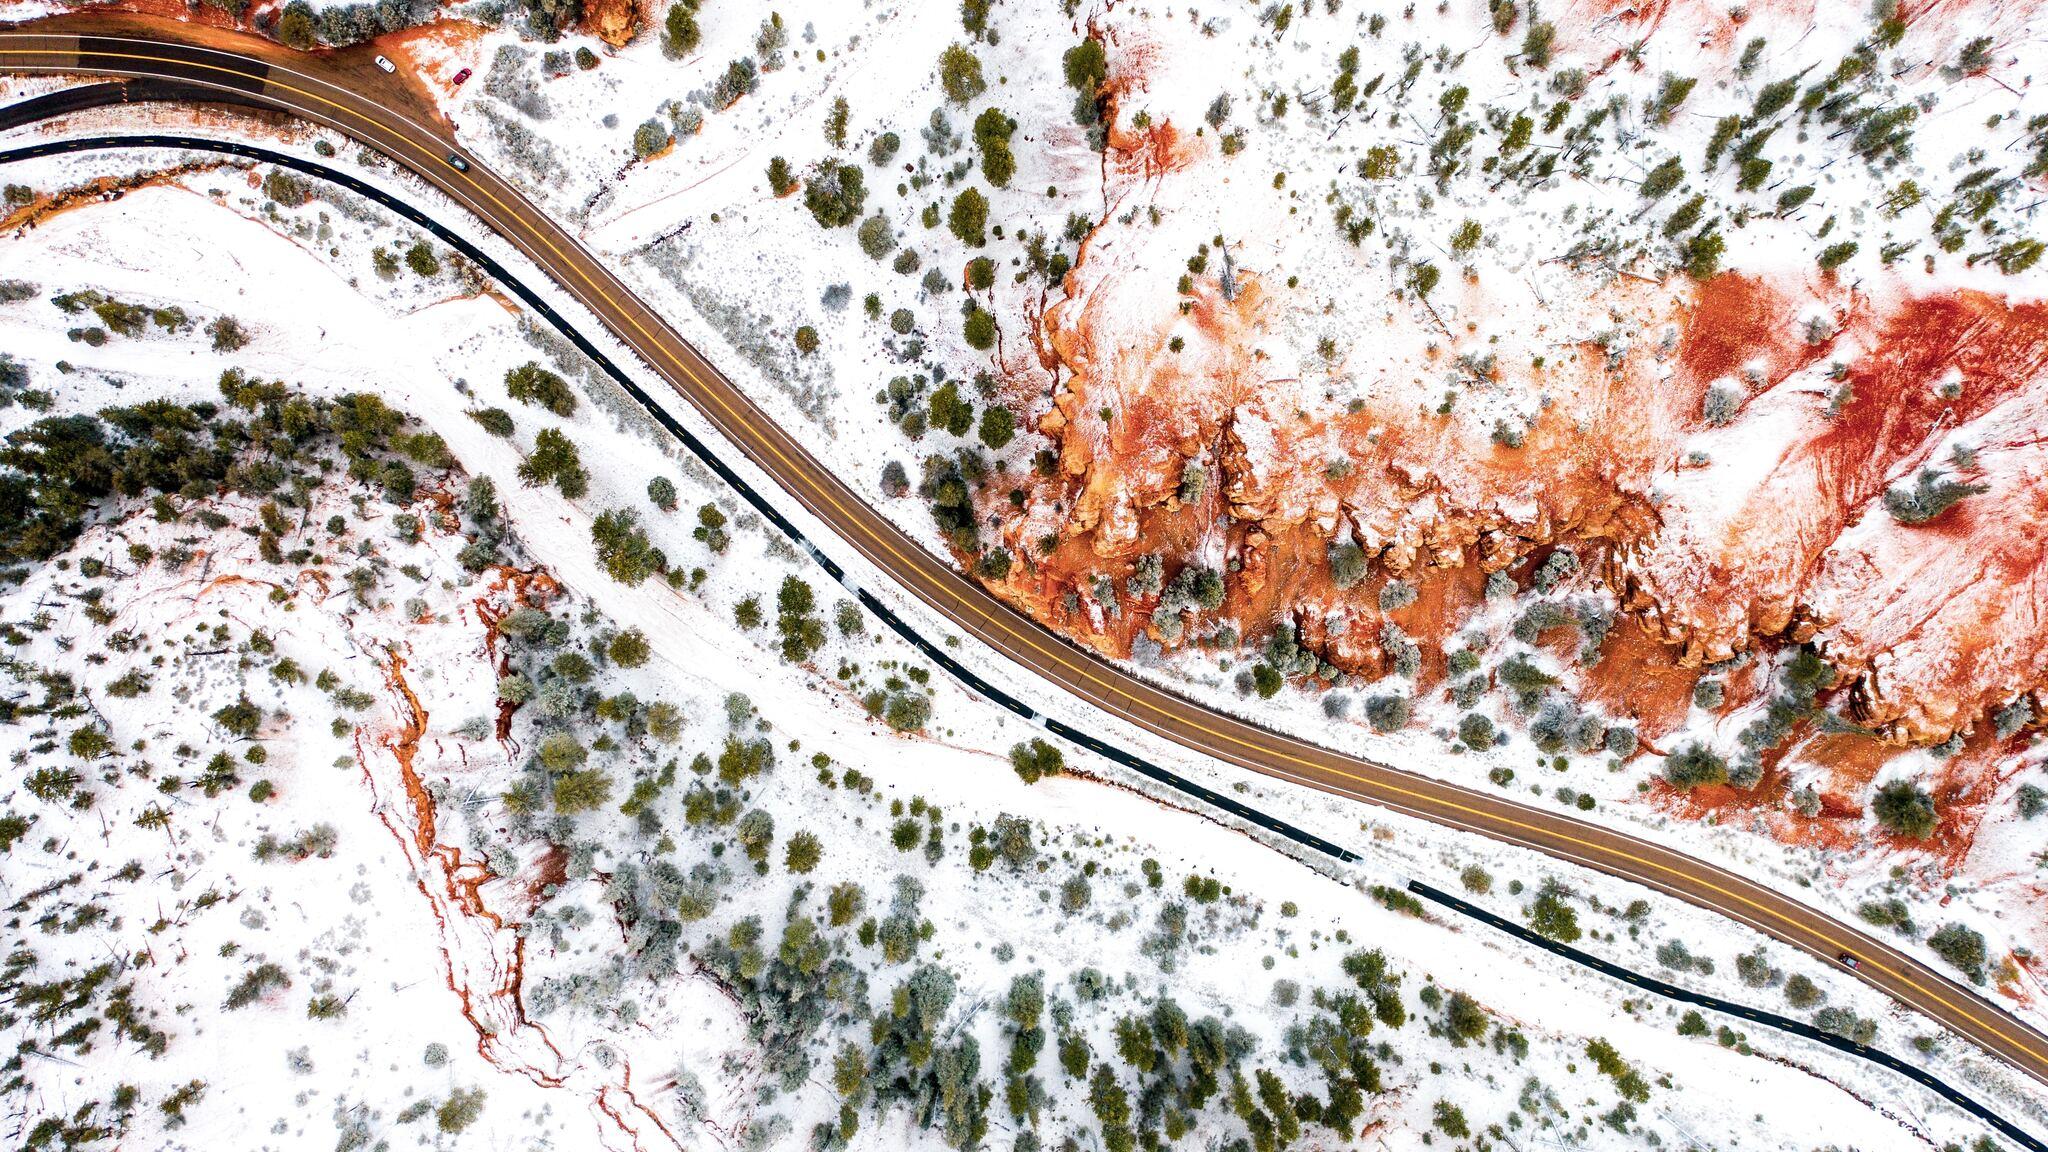 aerial-photography-winter-road-5k-v7.jpg